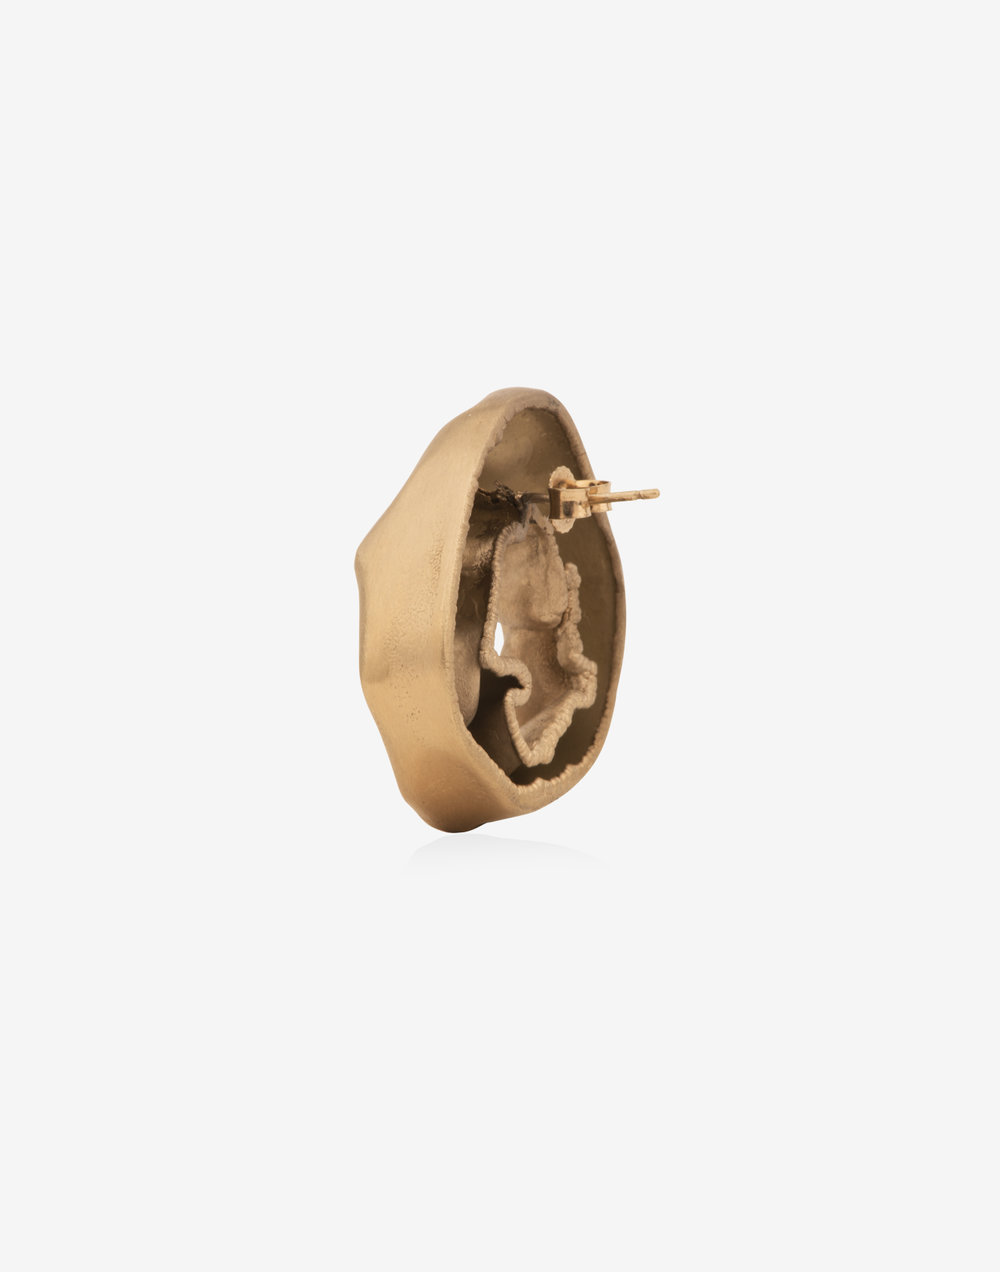 Completedworks-jewellery-R2020-Earring-Single-2-v1.jpg